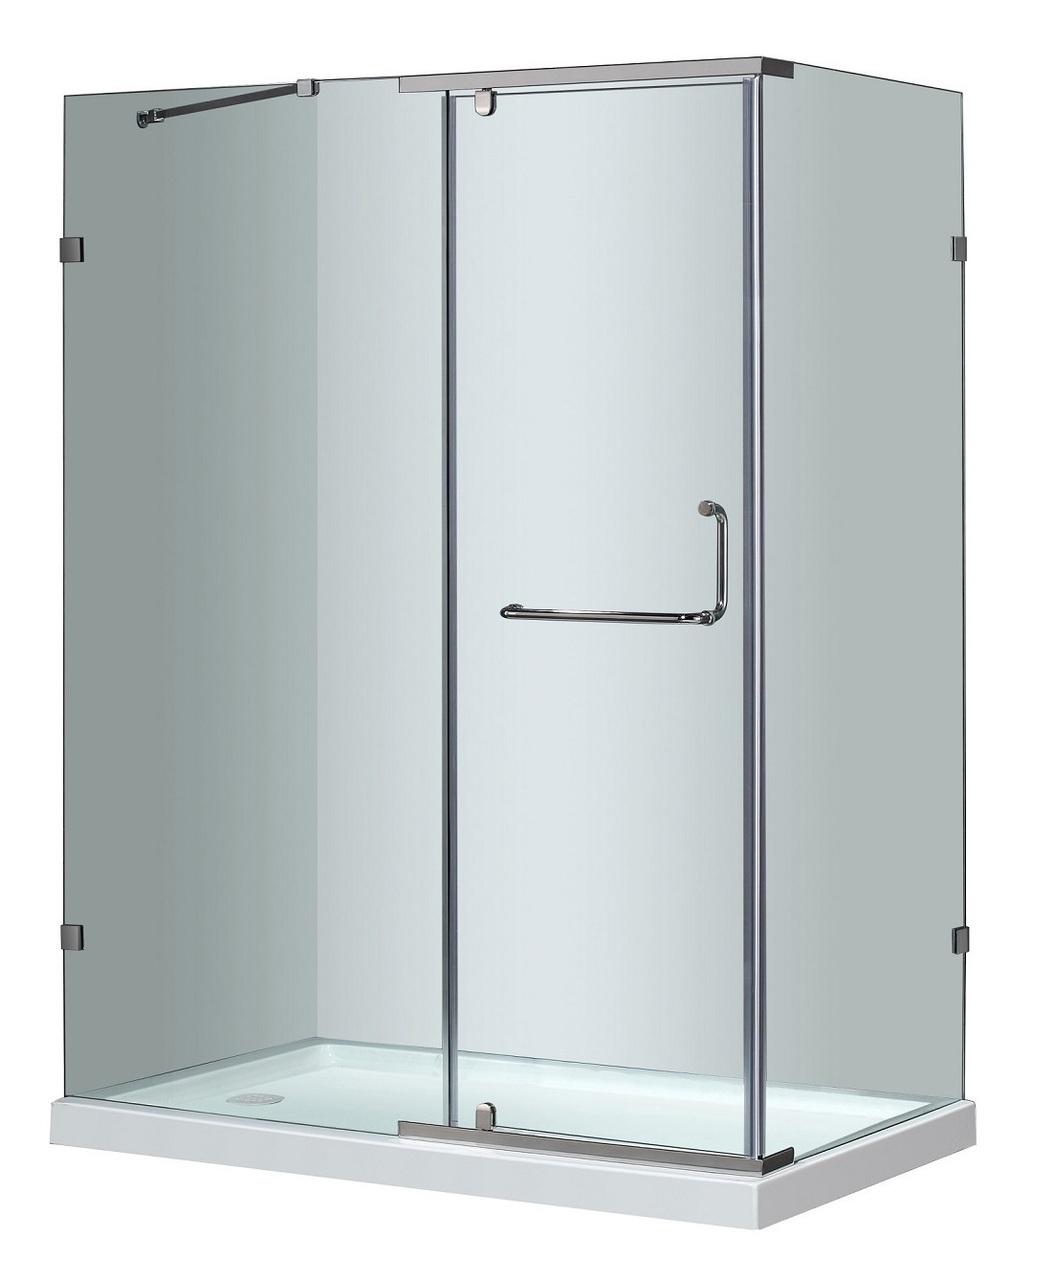 60 X 35 Semi Frameless Shower Enclosure With Base